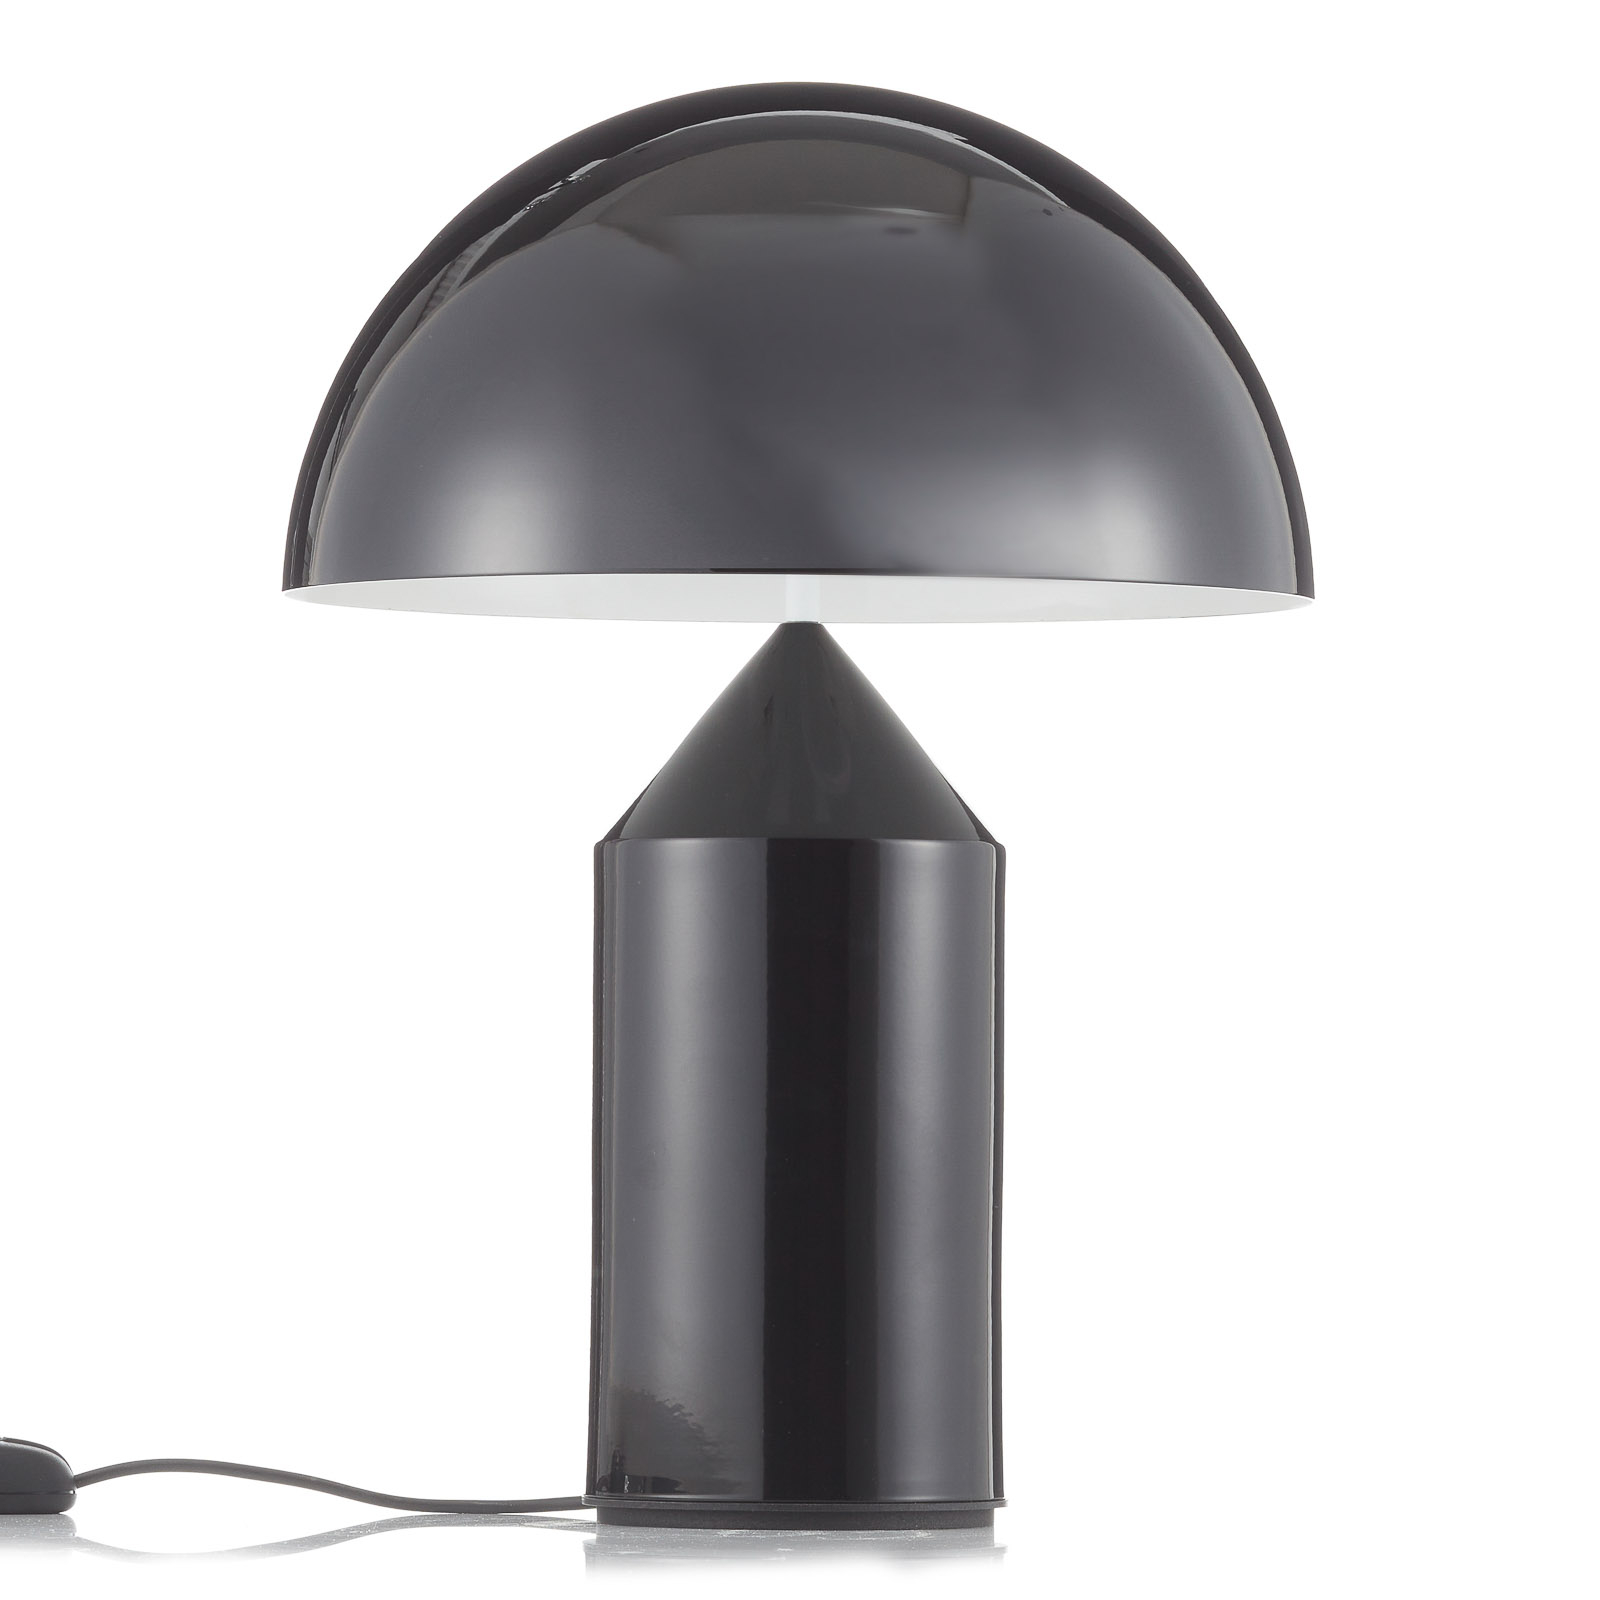 Oluce Atollo - lampe à poser de designer, noire